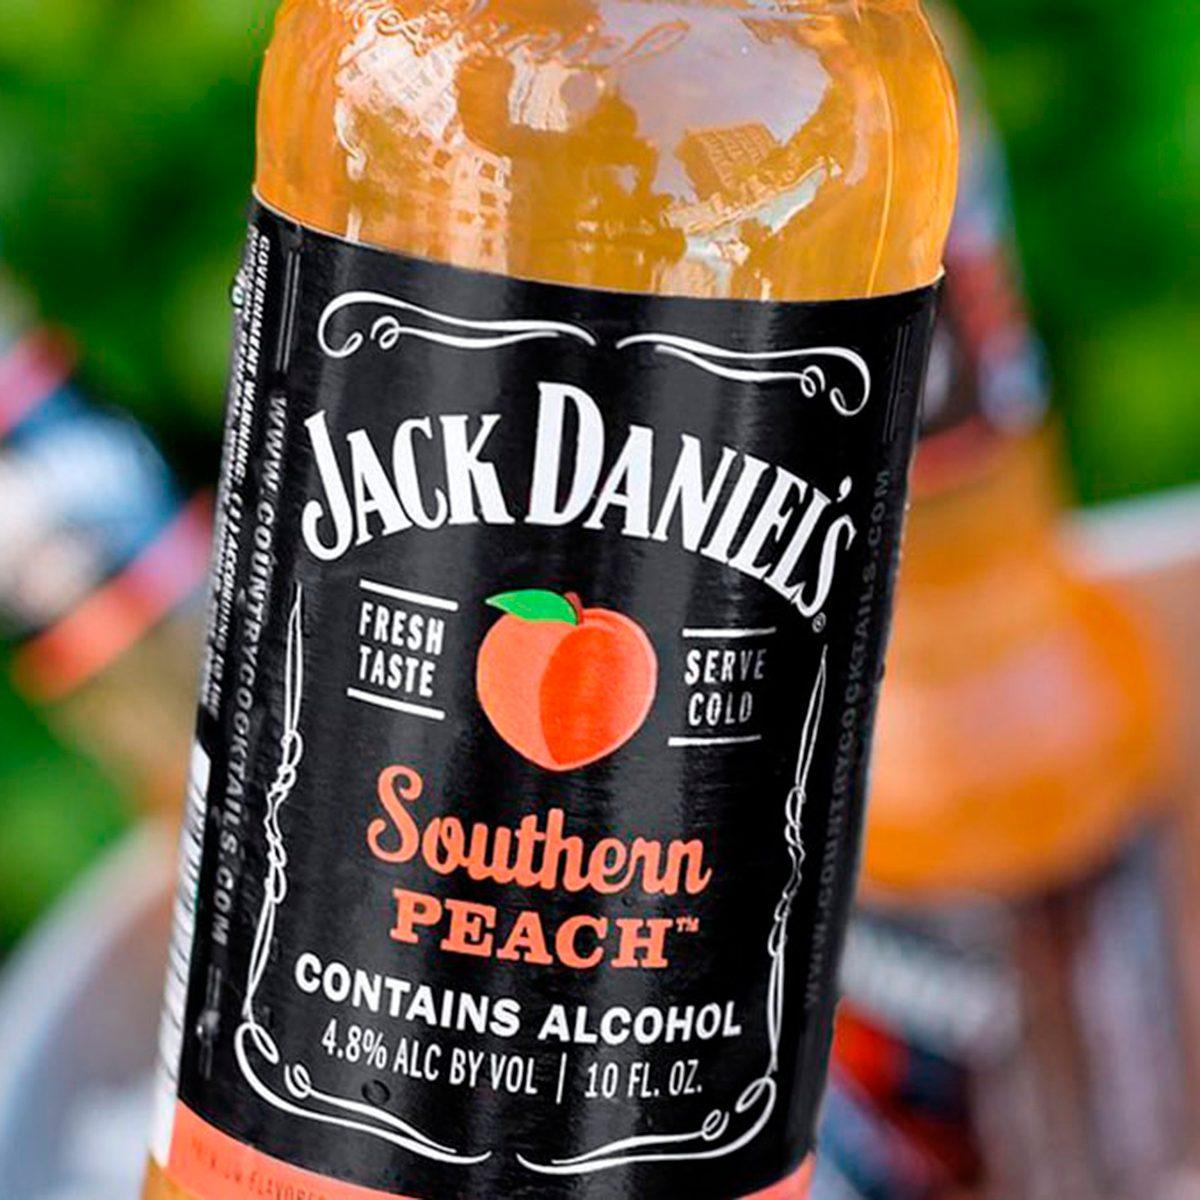 Jack Daniels Southern Peach Cocktail